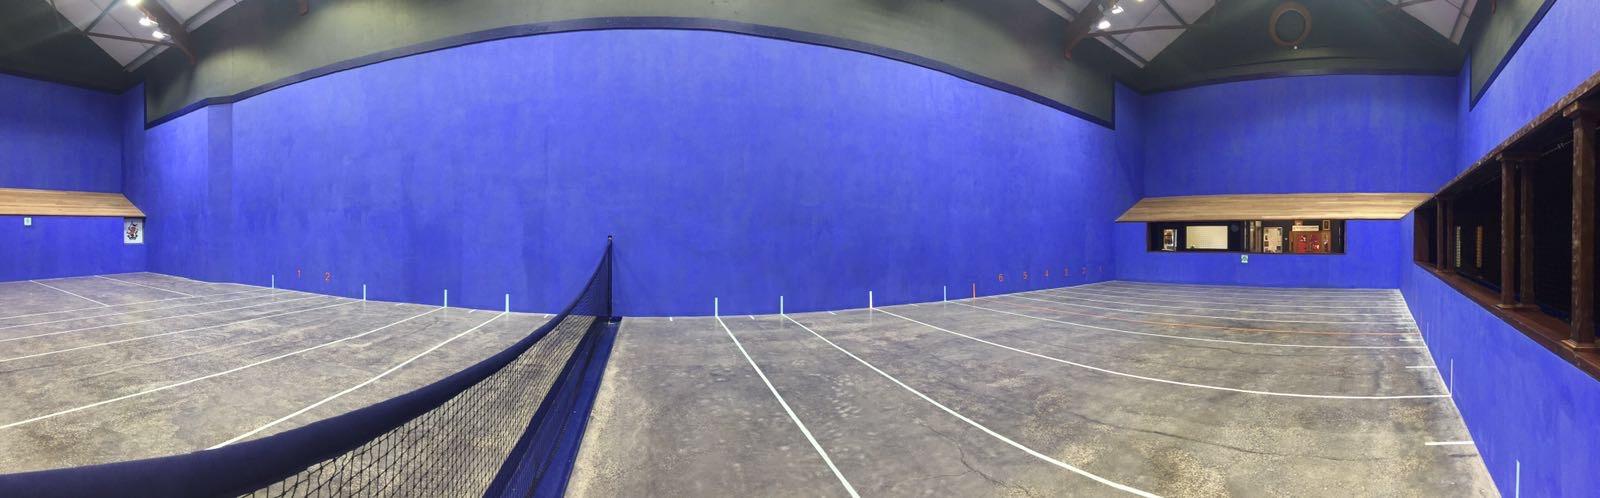 Wellington Real Tennis Club